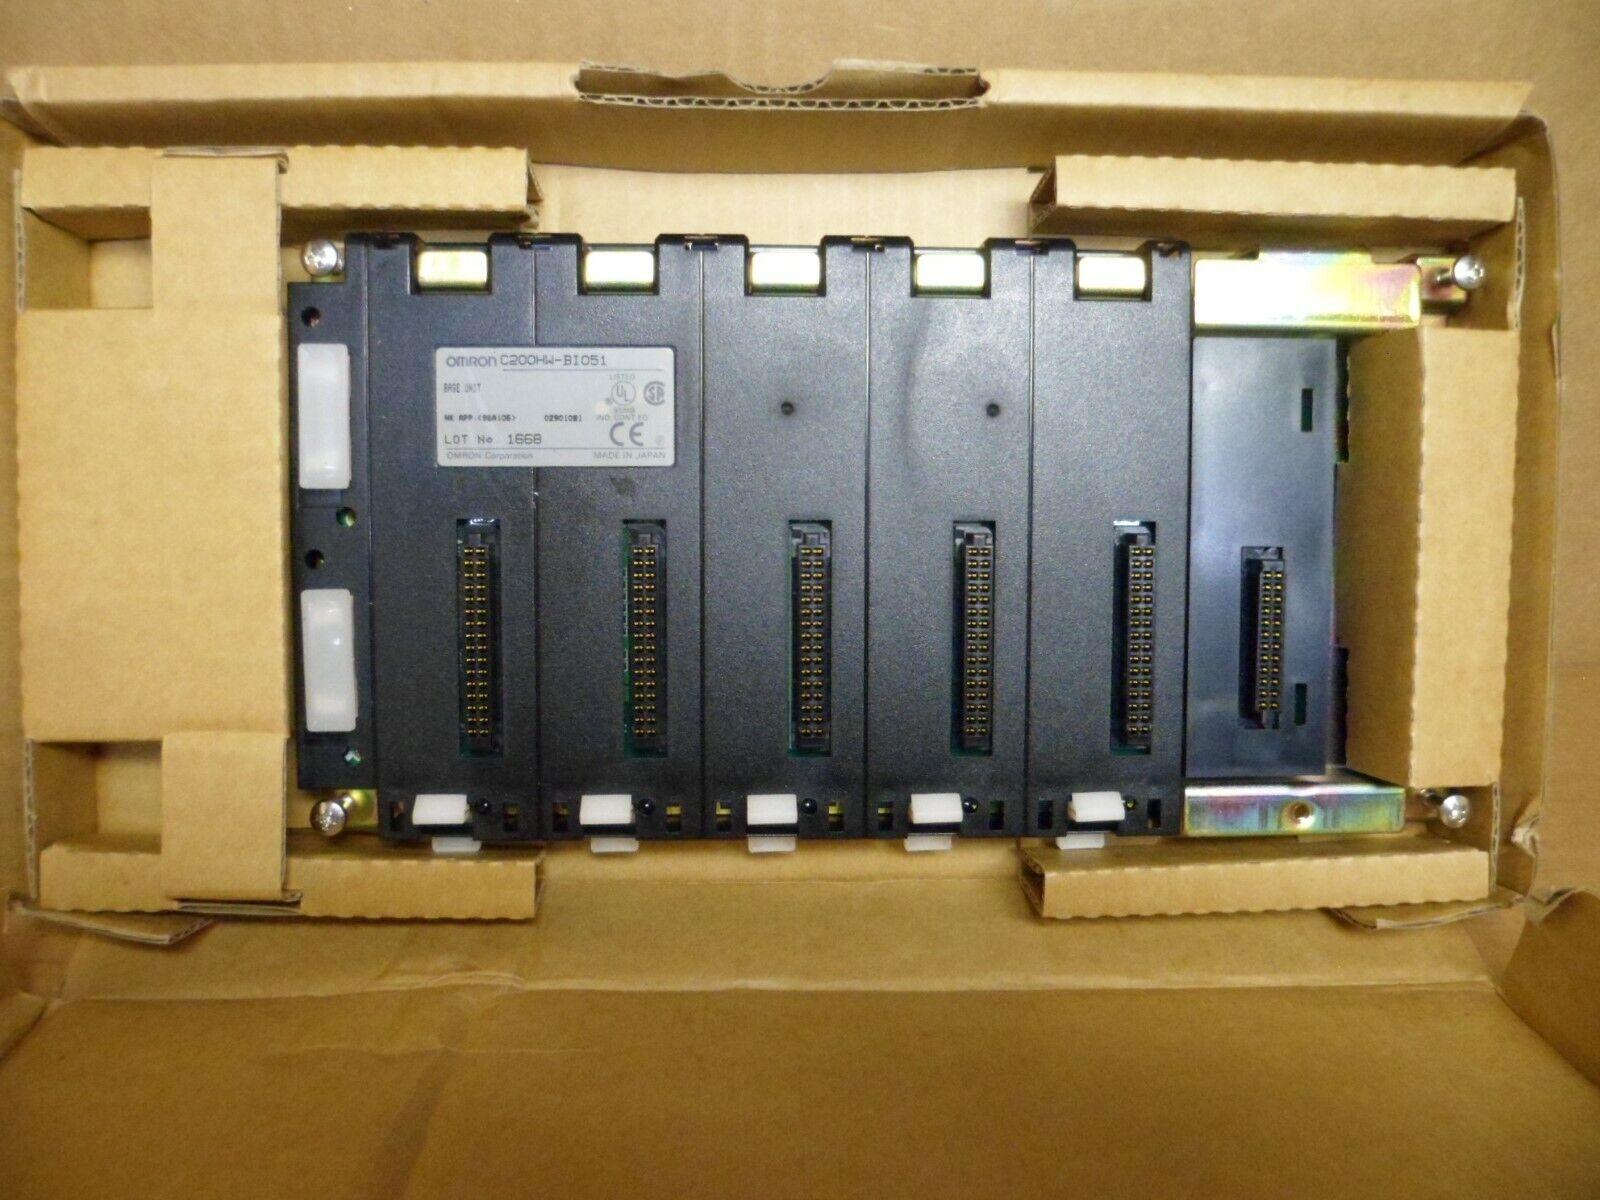 Spellbinding Lower price Phoenix Contact Bosch 35.75 25